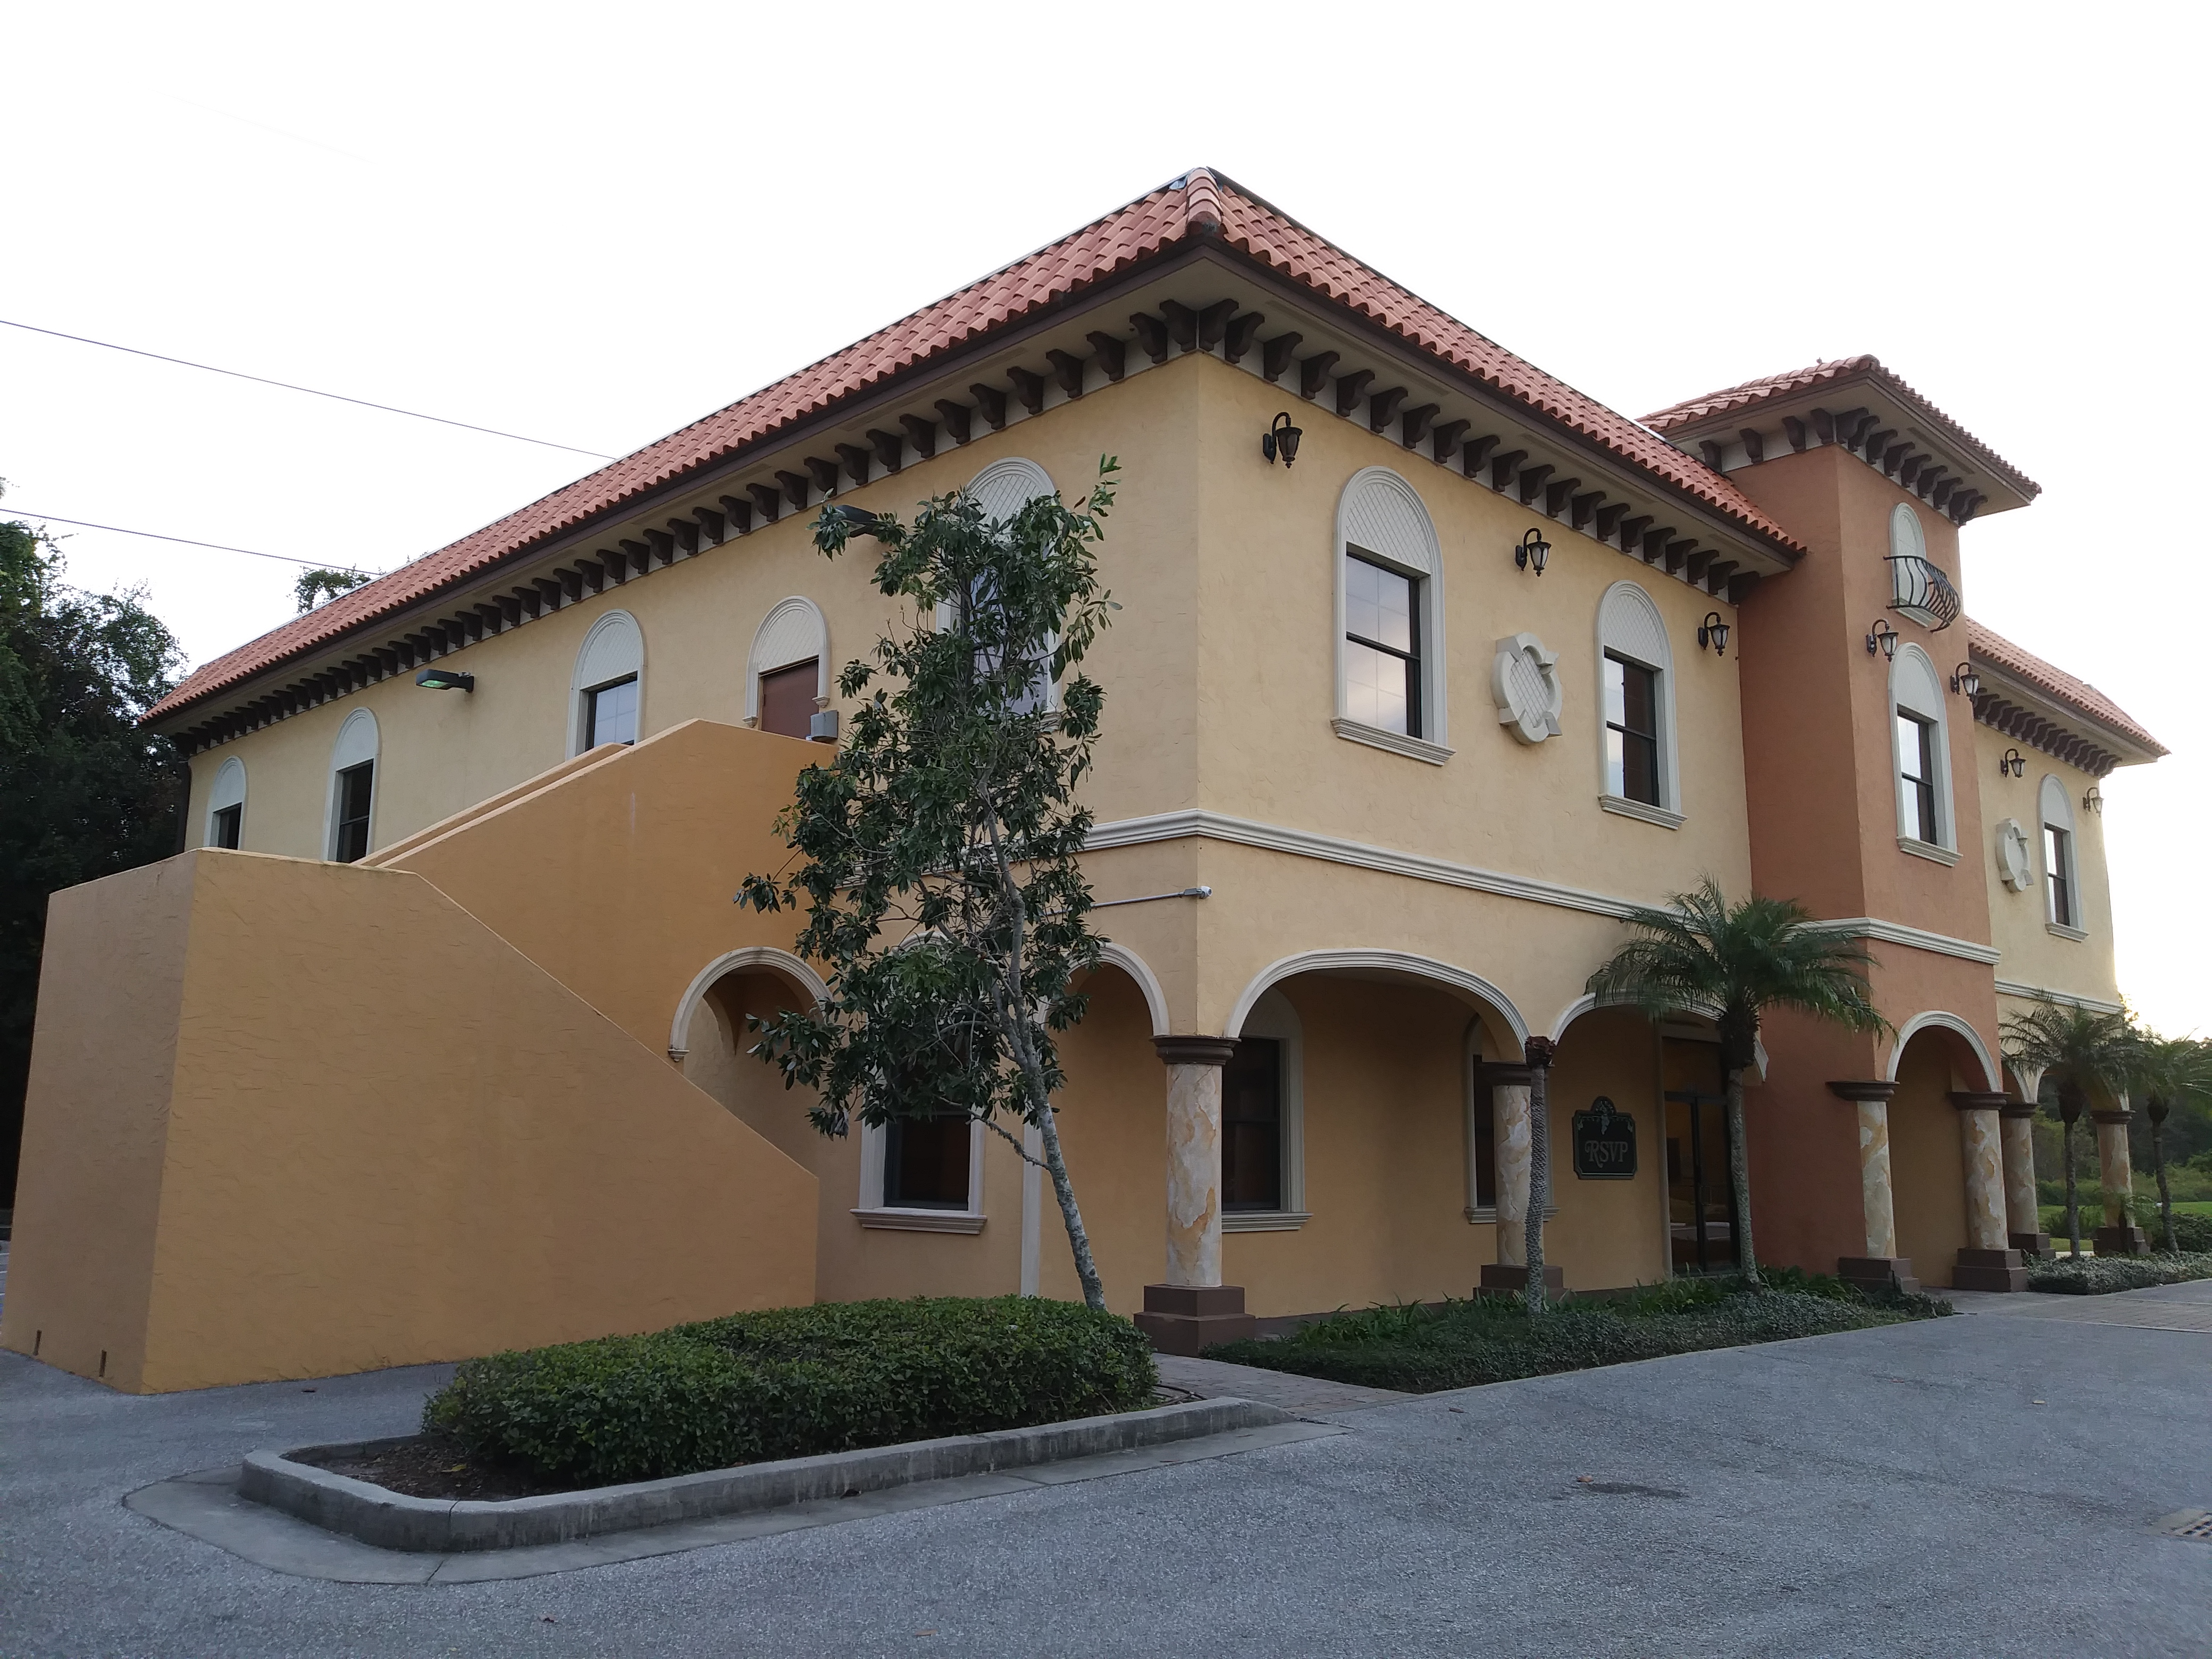 RSVP Office - Main Building - Left 2